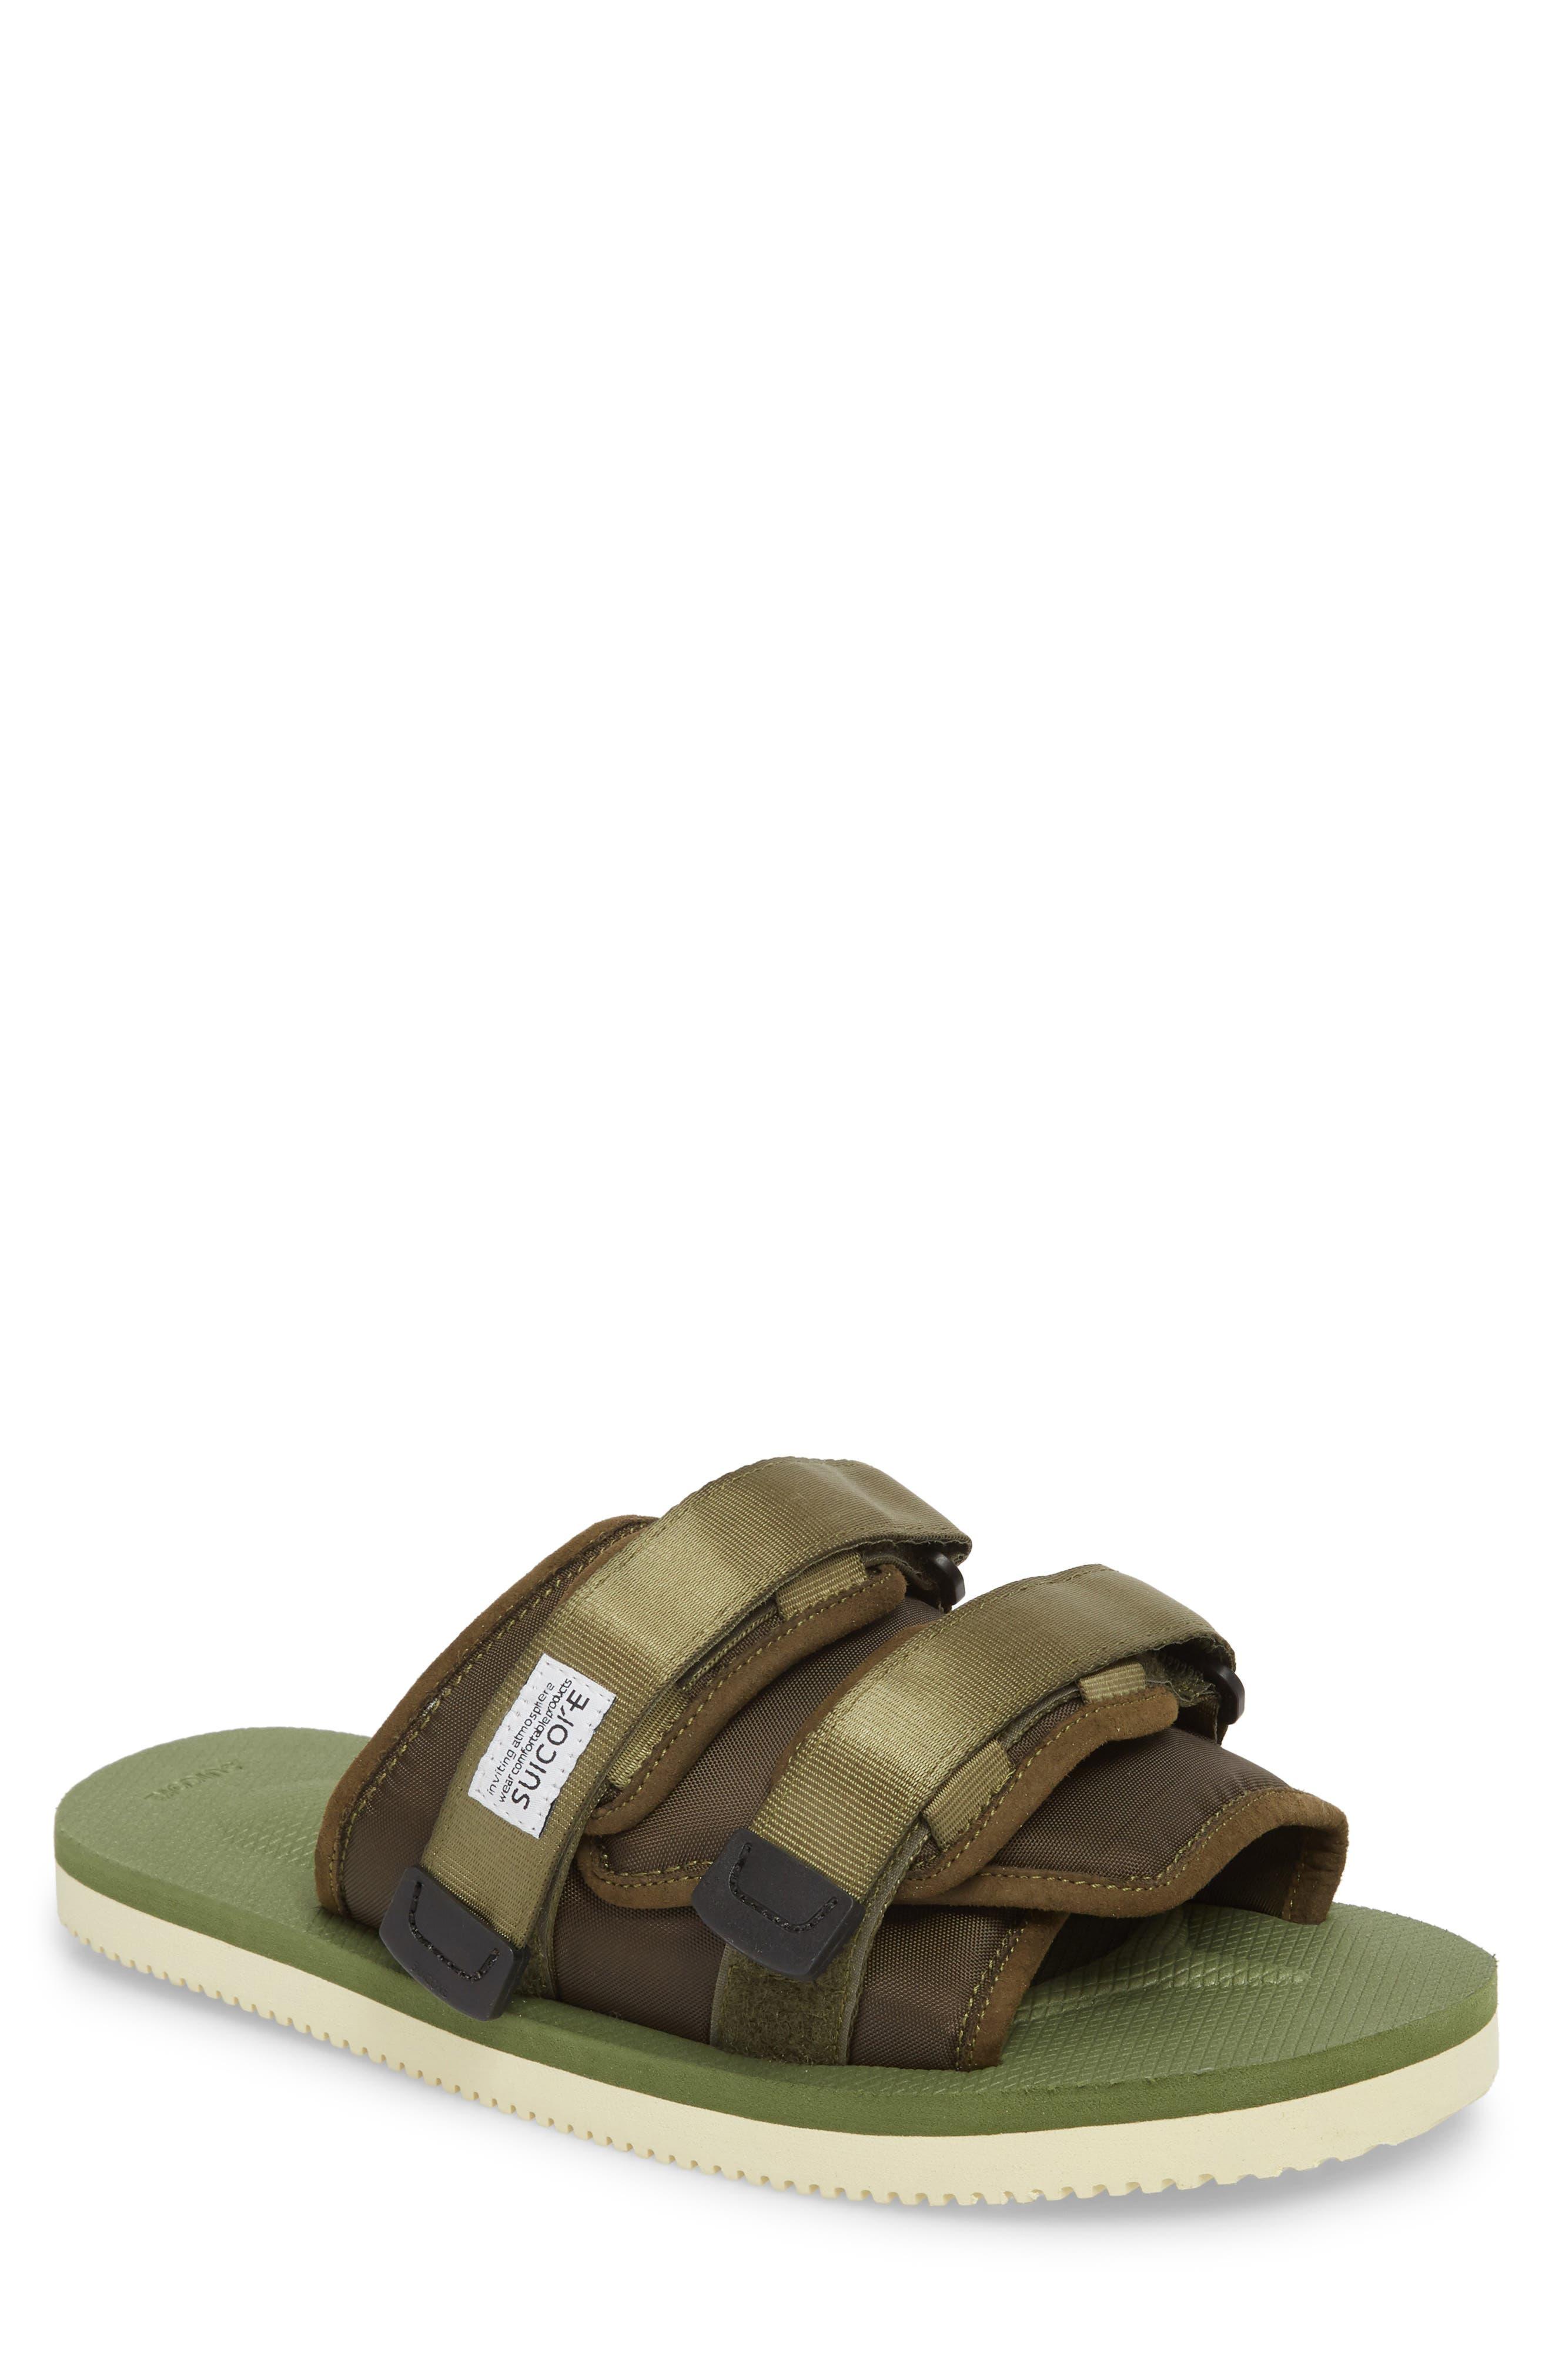 Alternate Image 1 Selected - Suicoke Moto Cab Slide Sandal (Men)